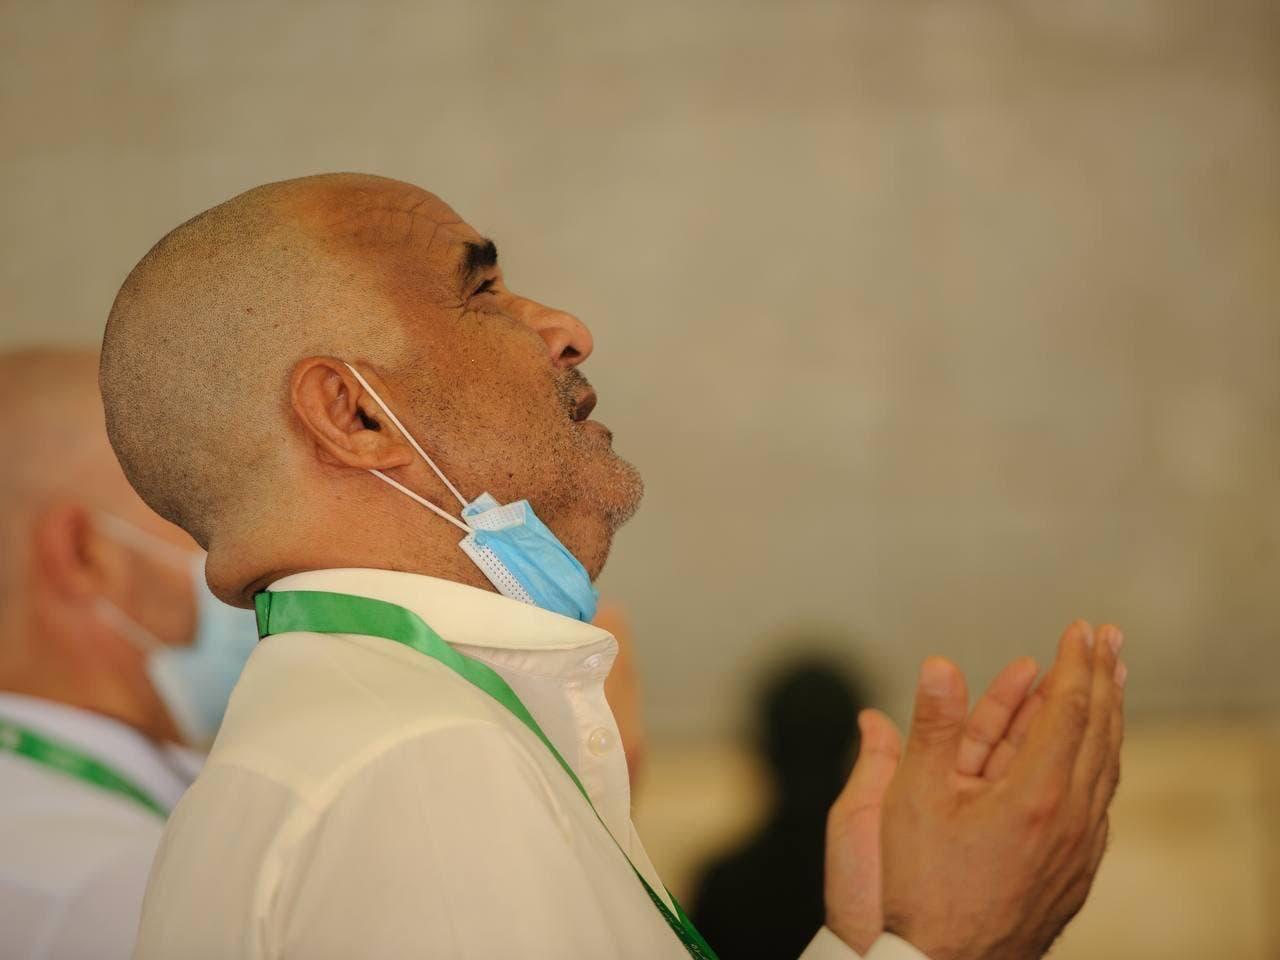 The prayer of the pilgrims